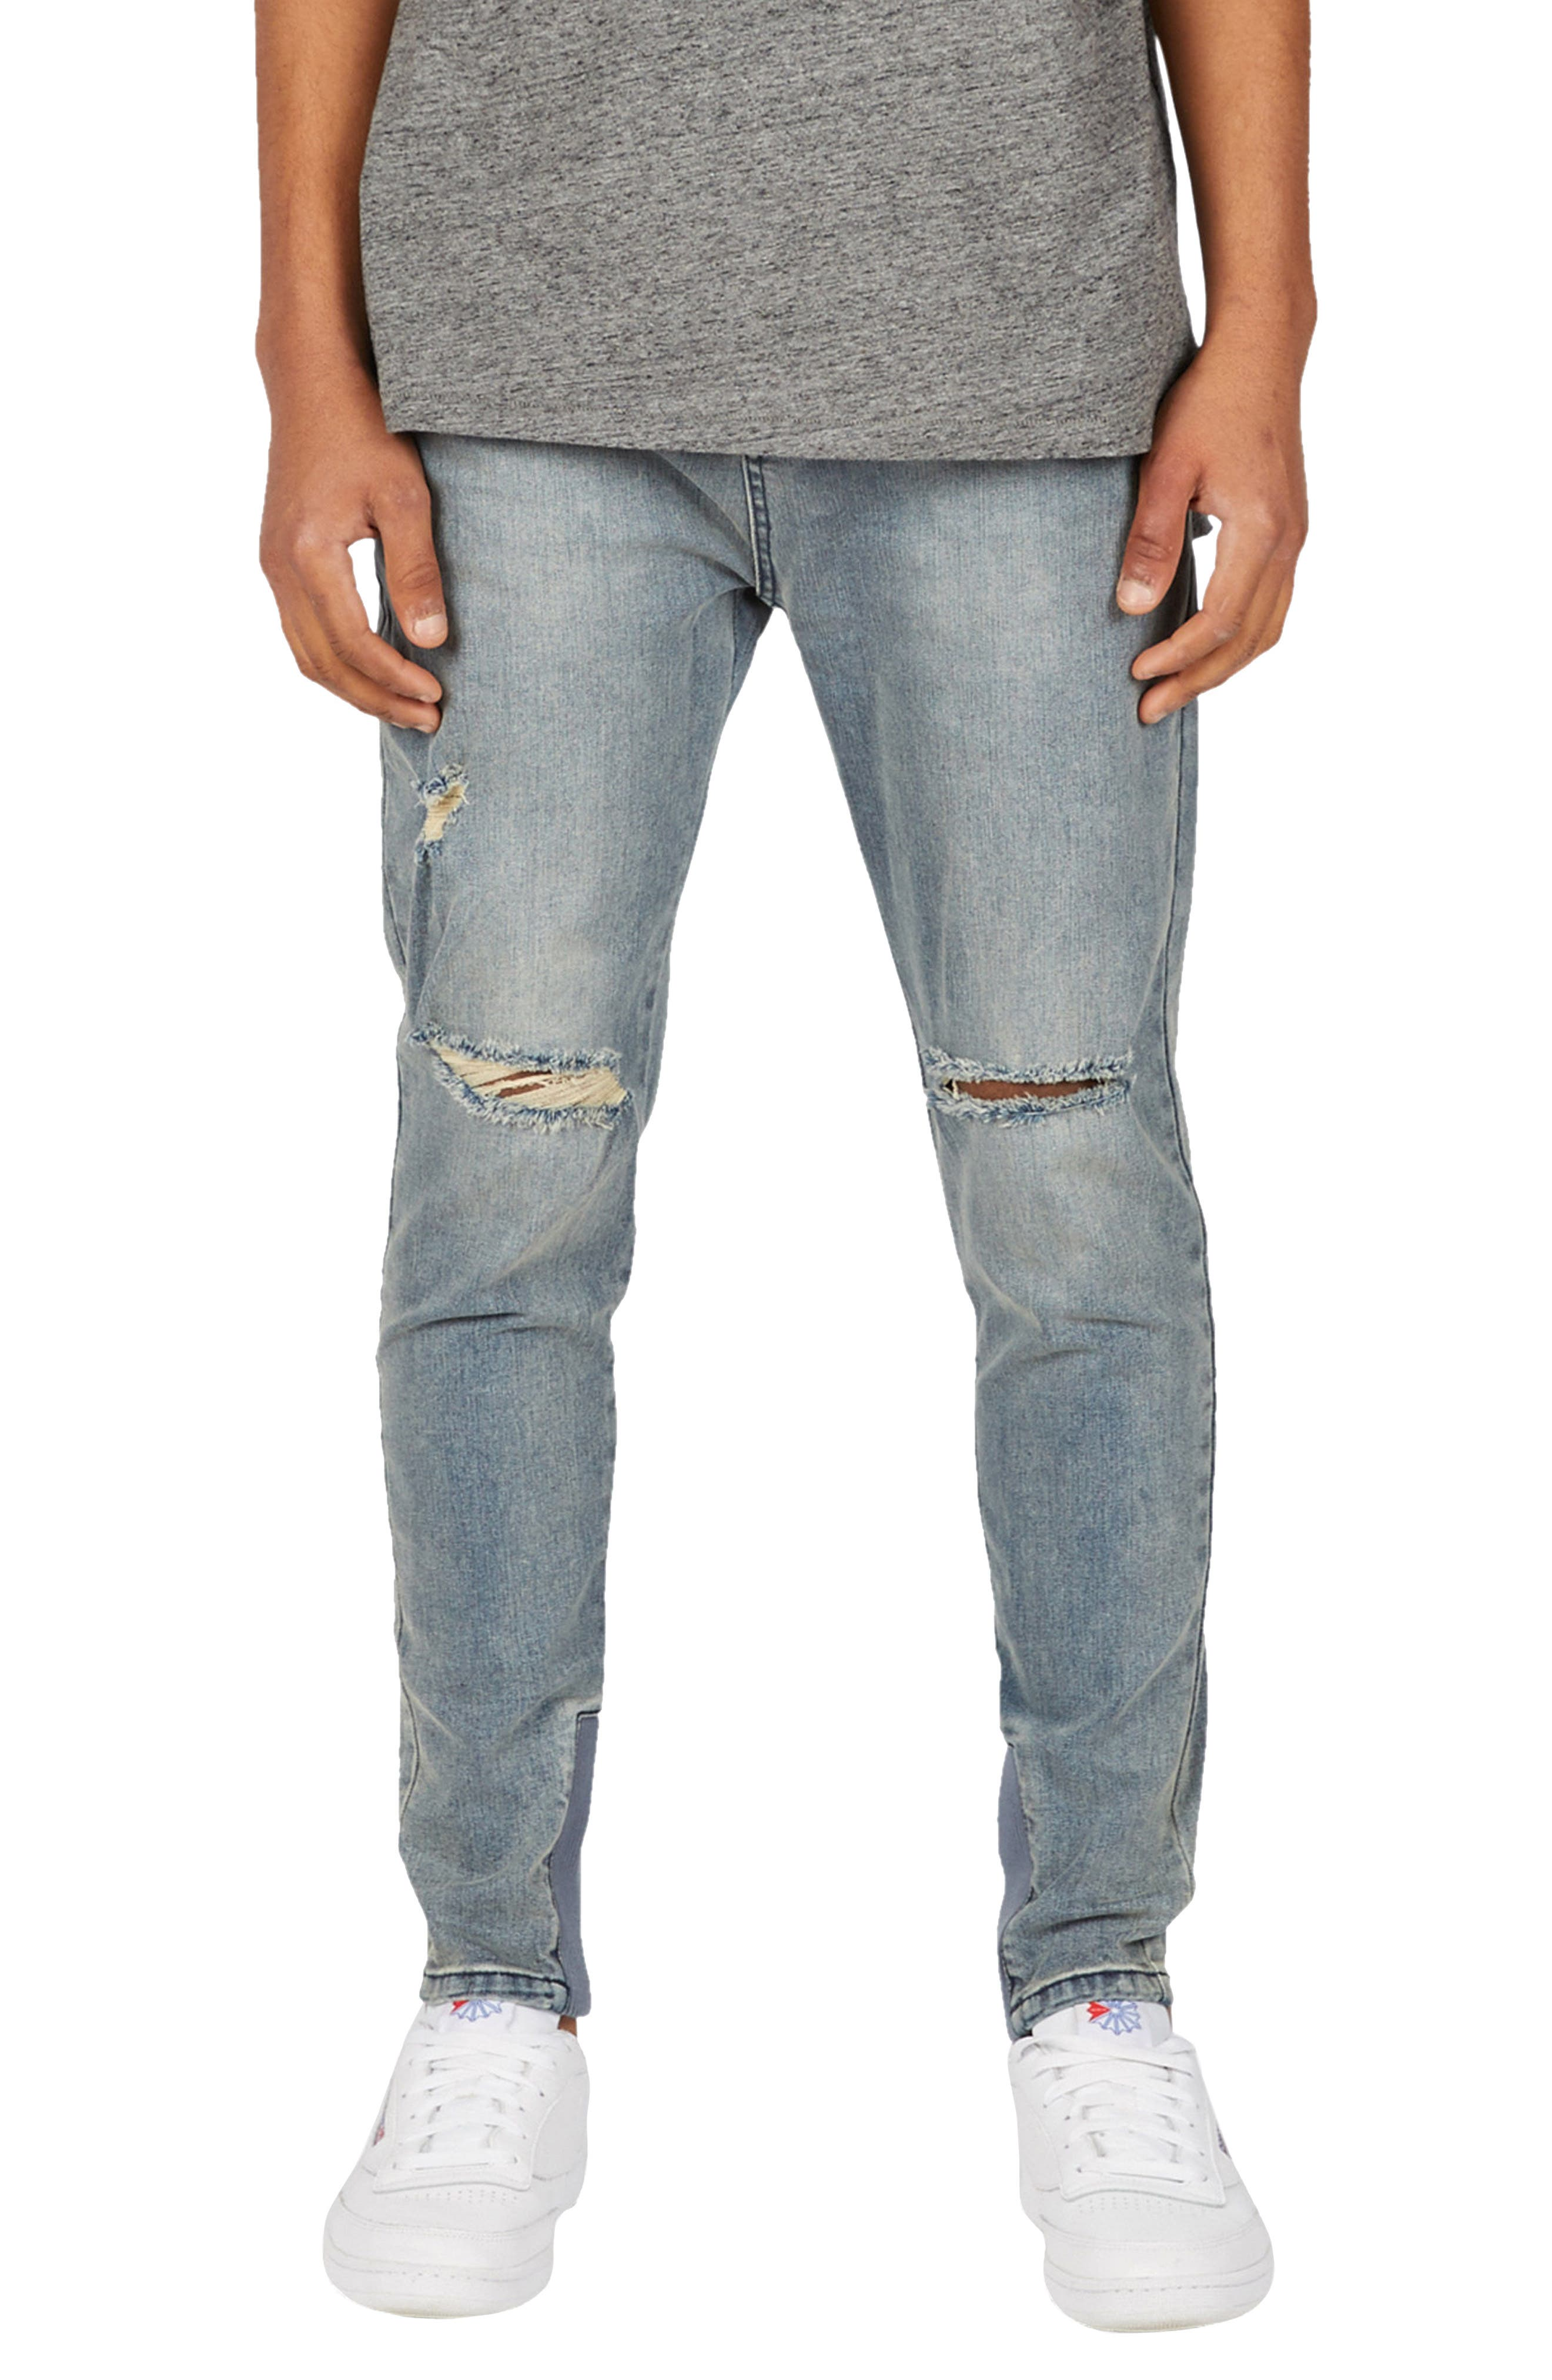 Sharpshot Slouchy Slim Fit Jeans,                             Main thumbnail 1, color,